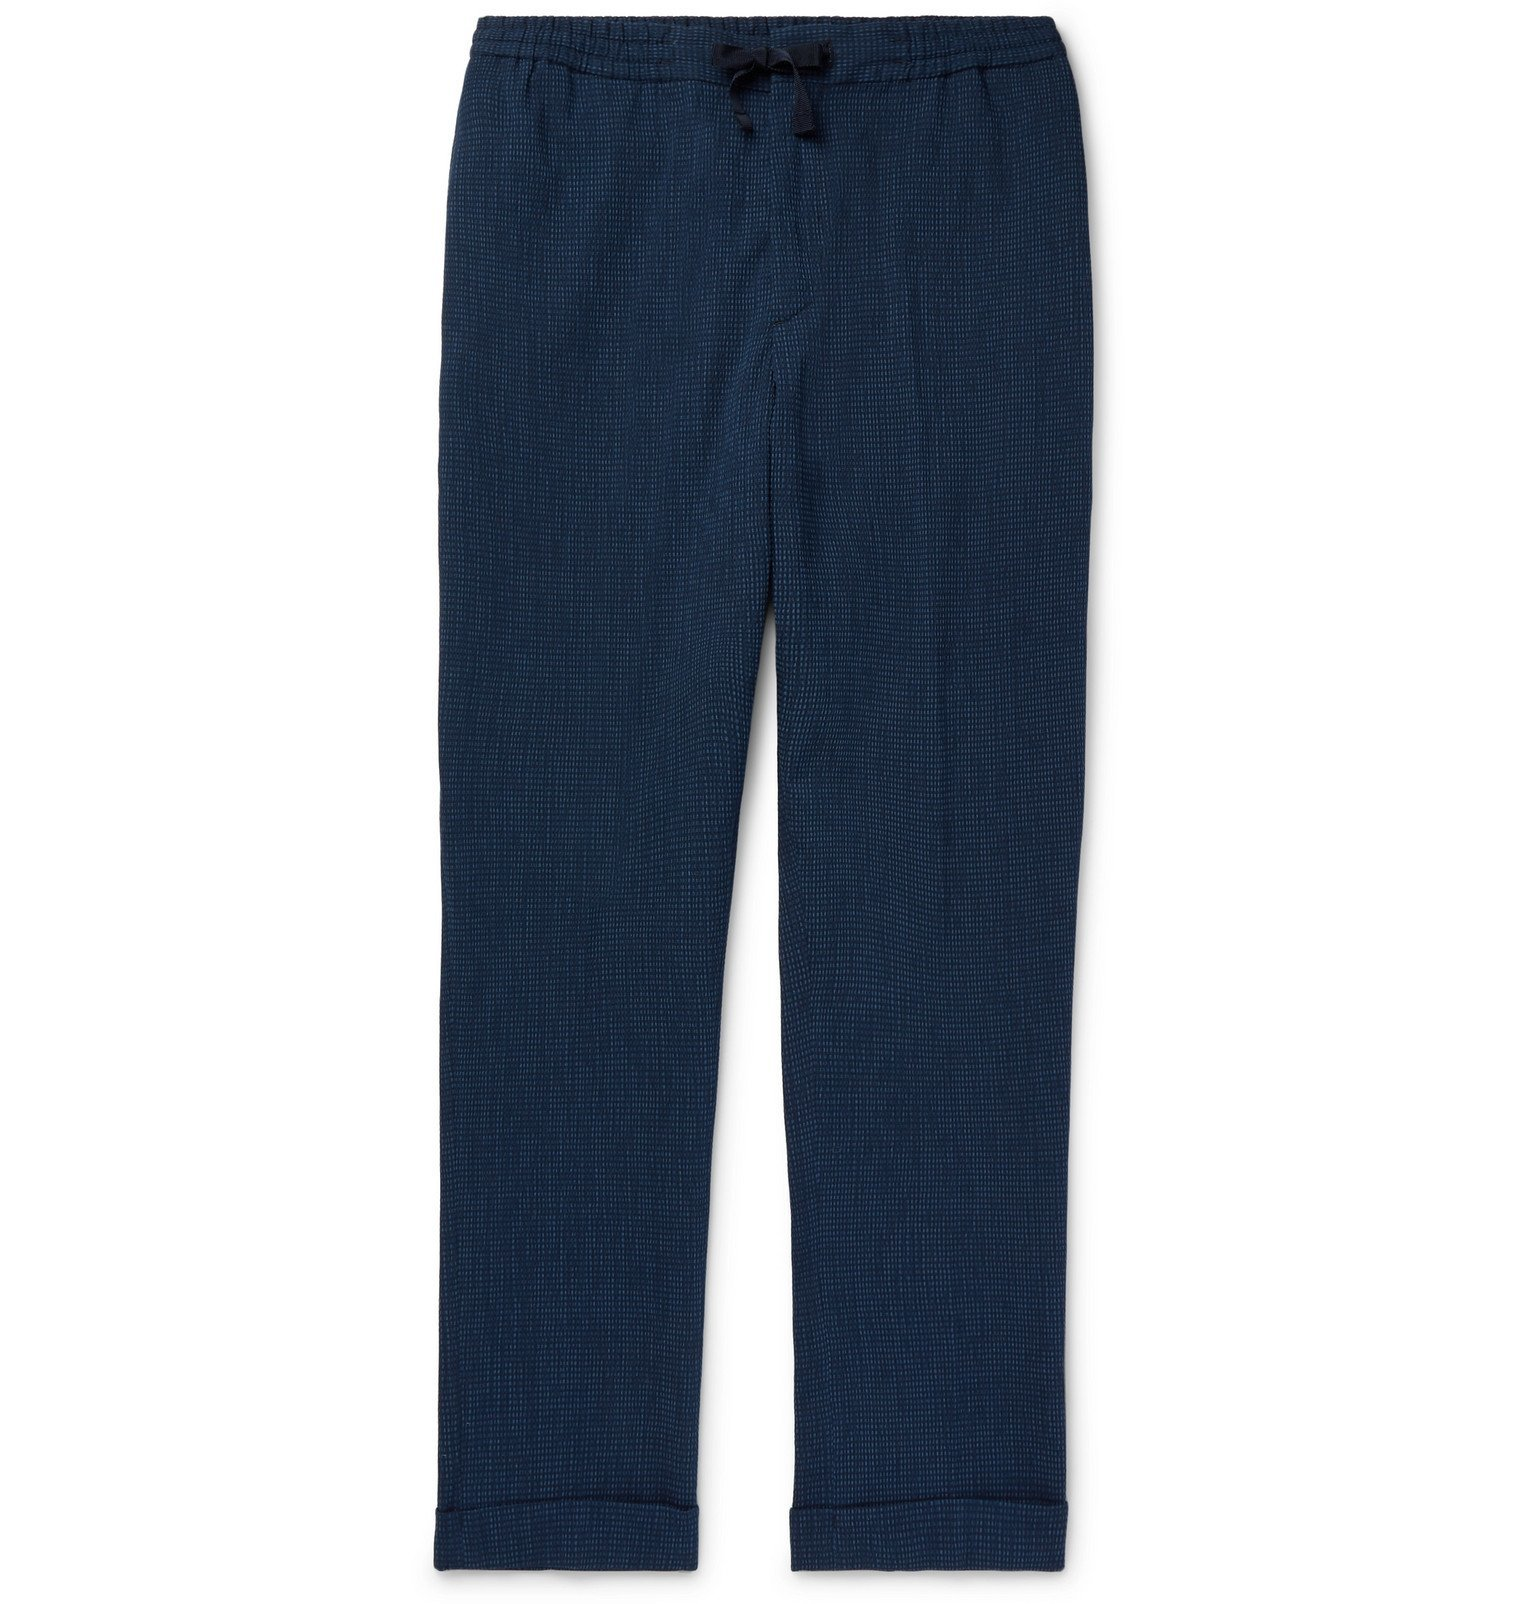 Officine Generale - Phil Checked Cotton-Blend Seersucker Drawstring Trousers - Blue